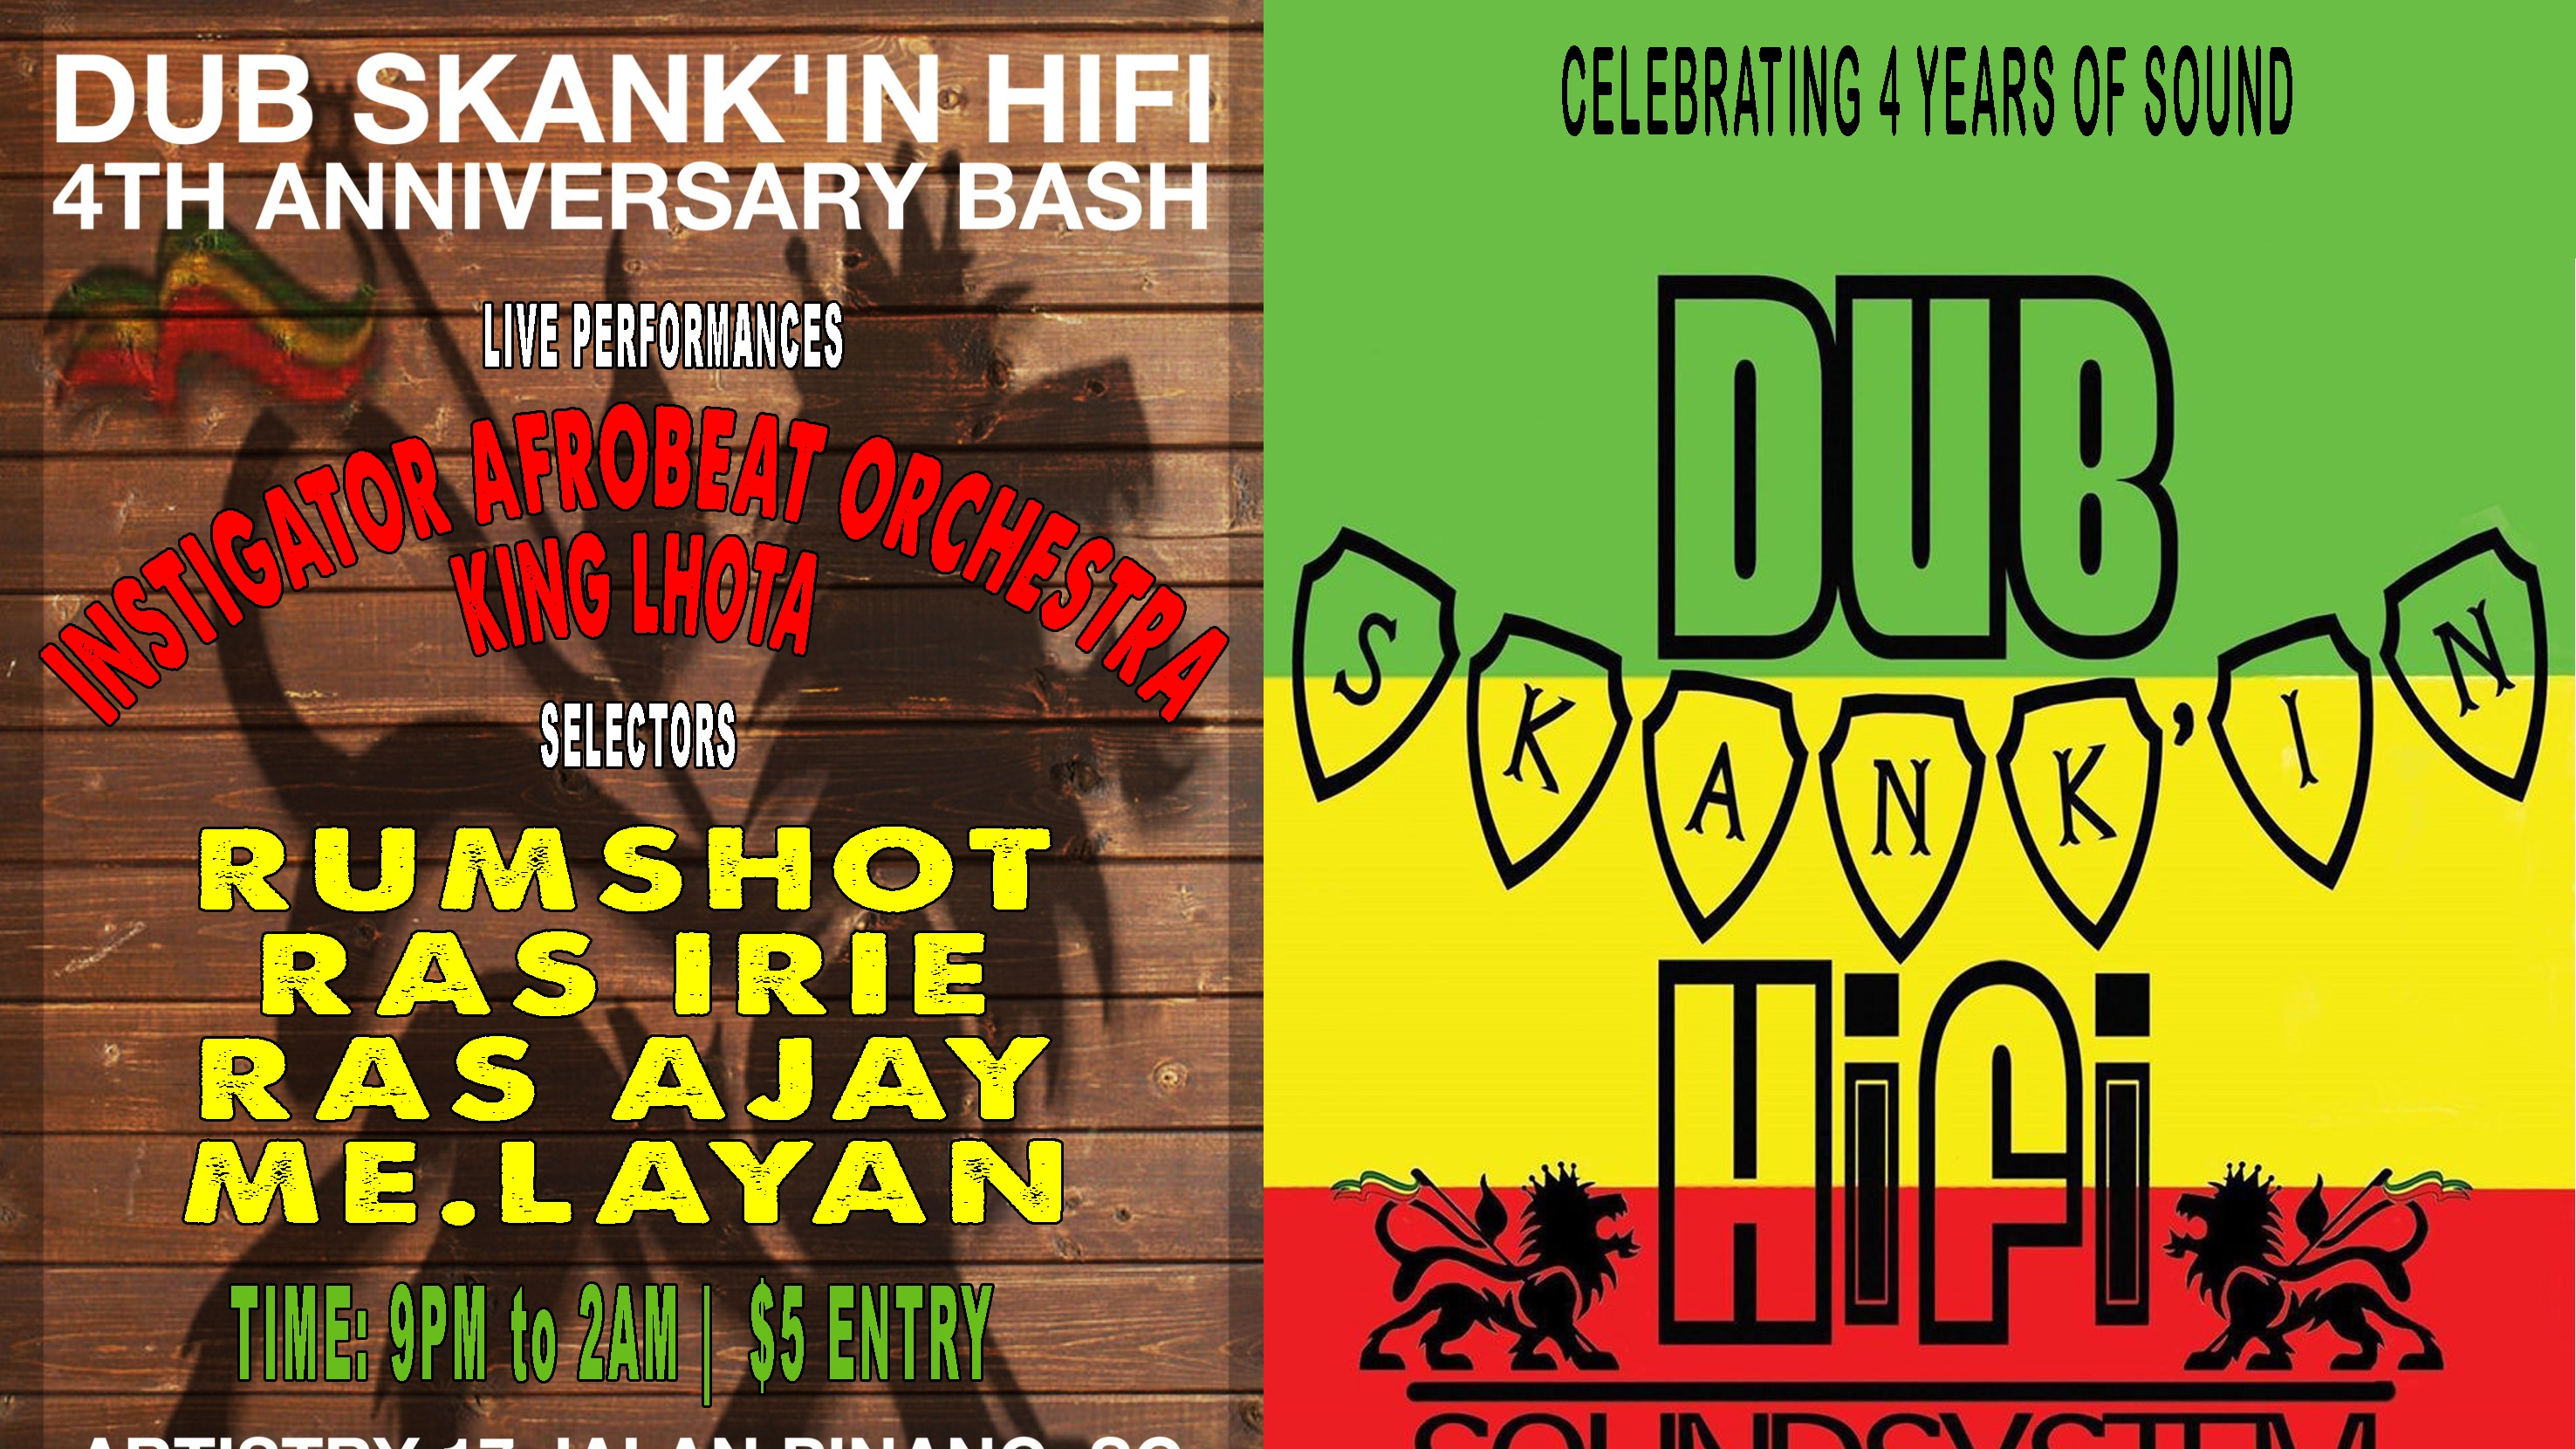 DUB SKANK'IN HIFI SOUNDSYSTEM 4TH ANNIVERSARY BASH